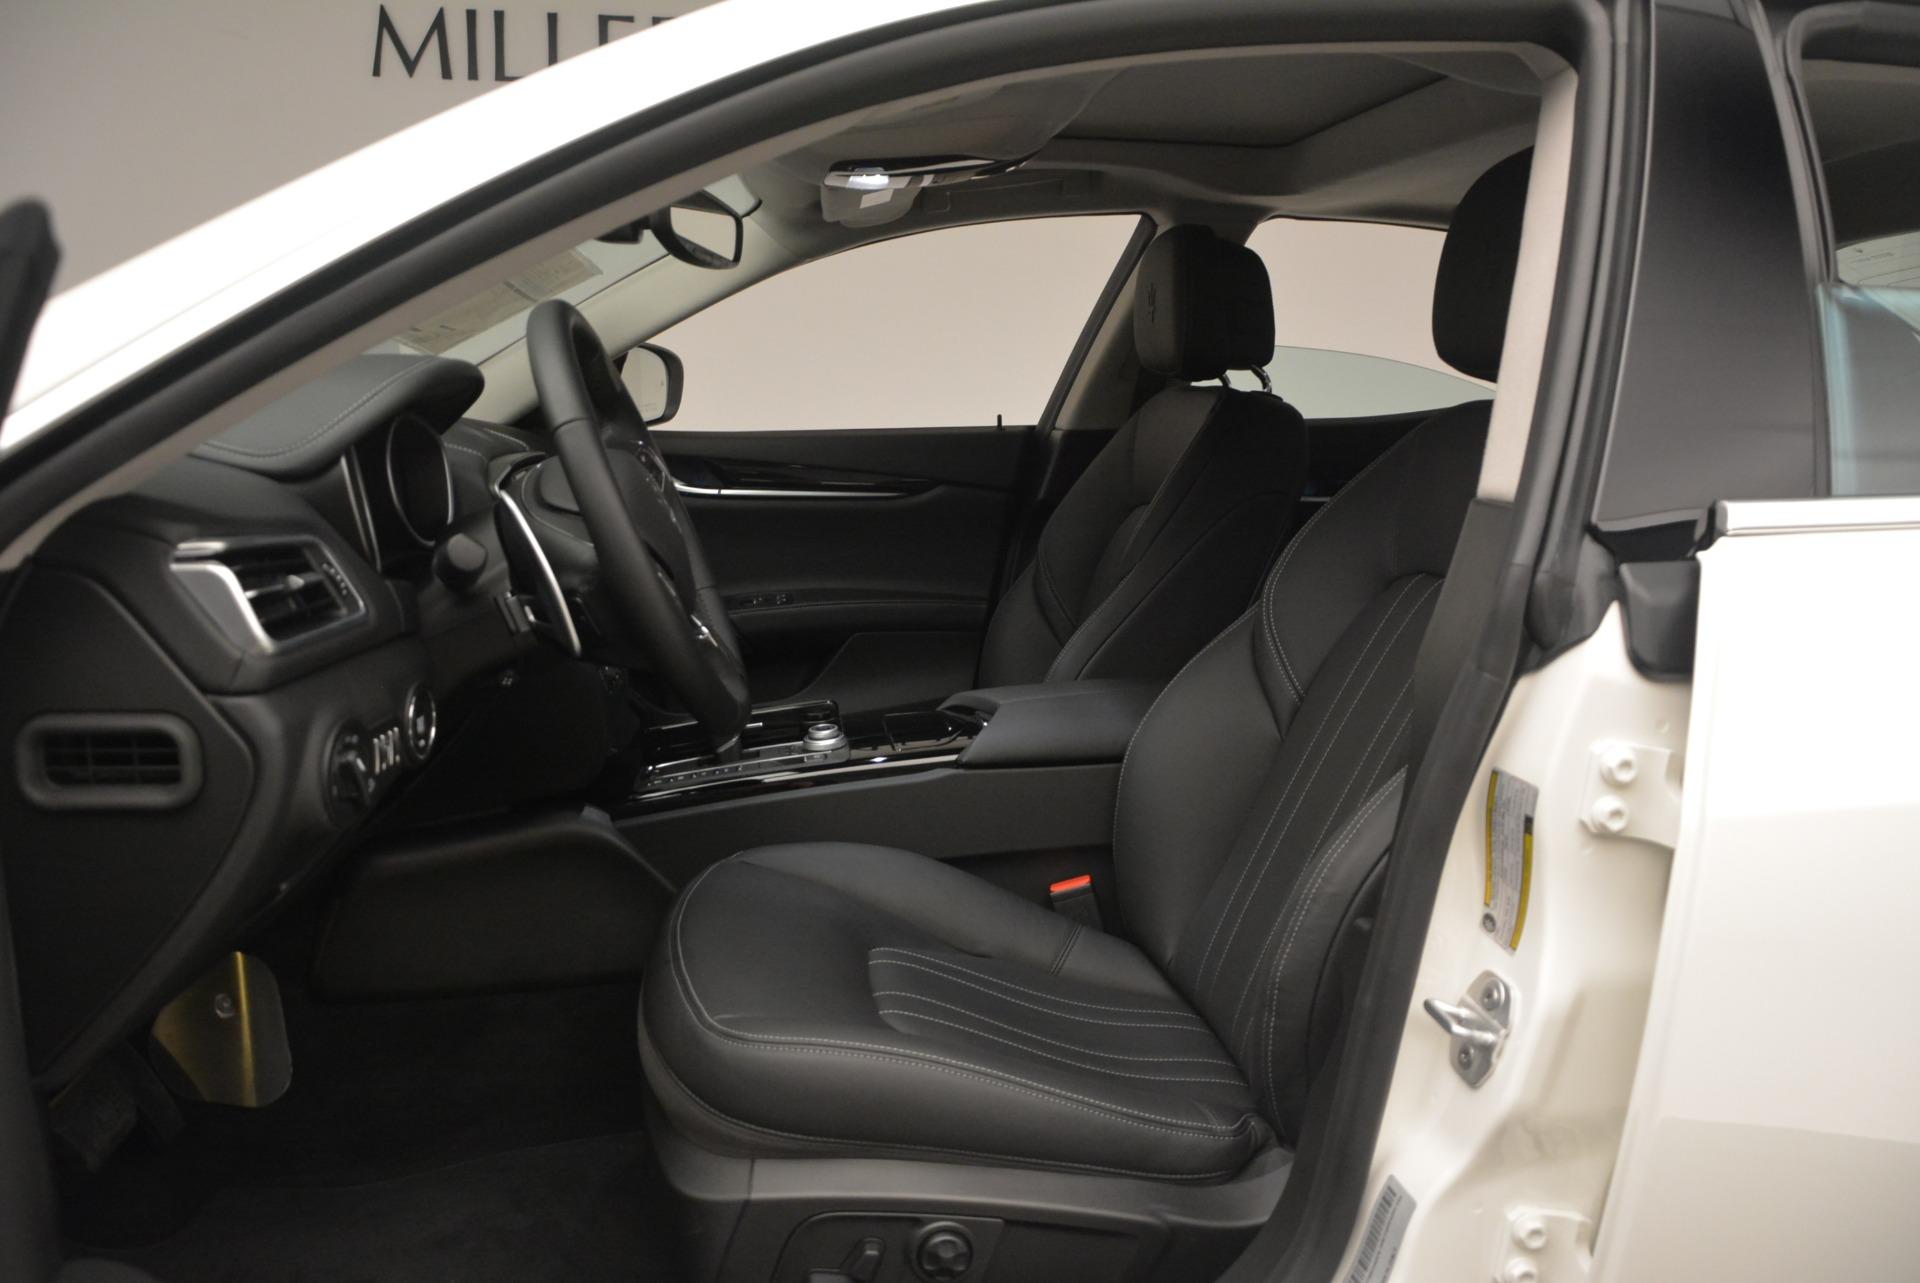 New-2017-Maserati-Ghibli-S-Q4-EX-Loaner